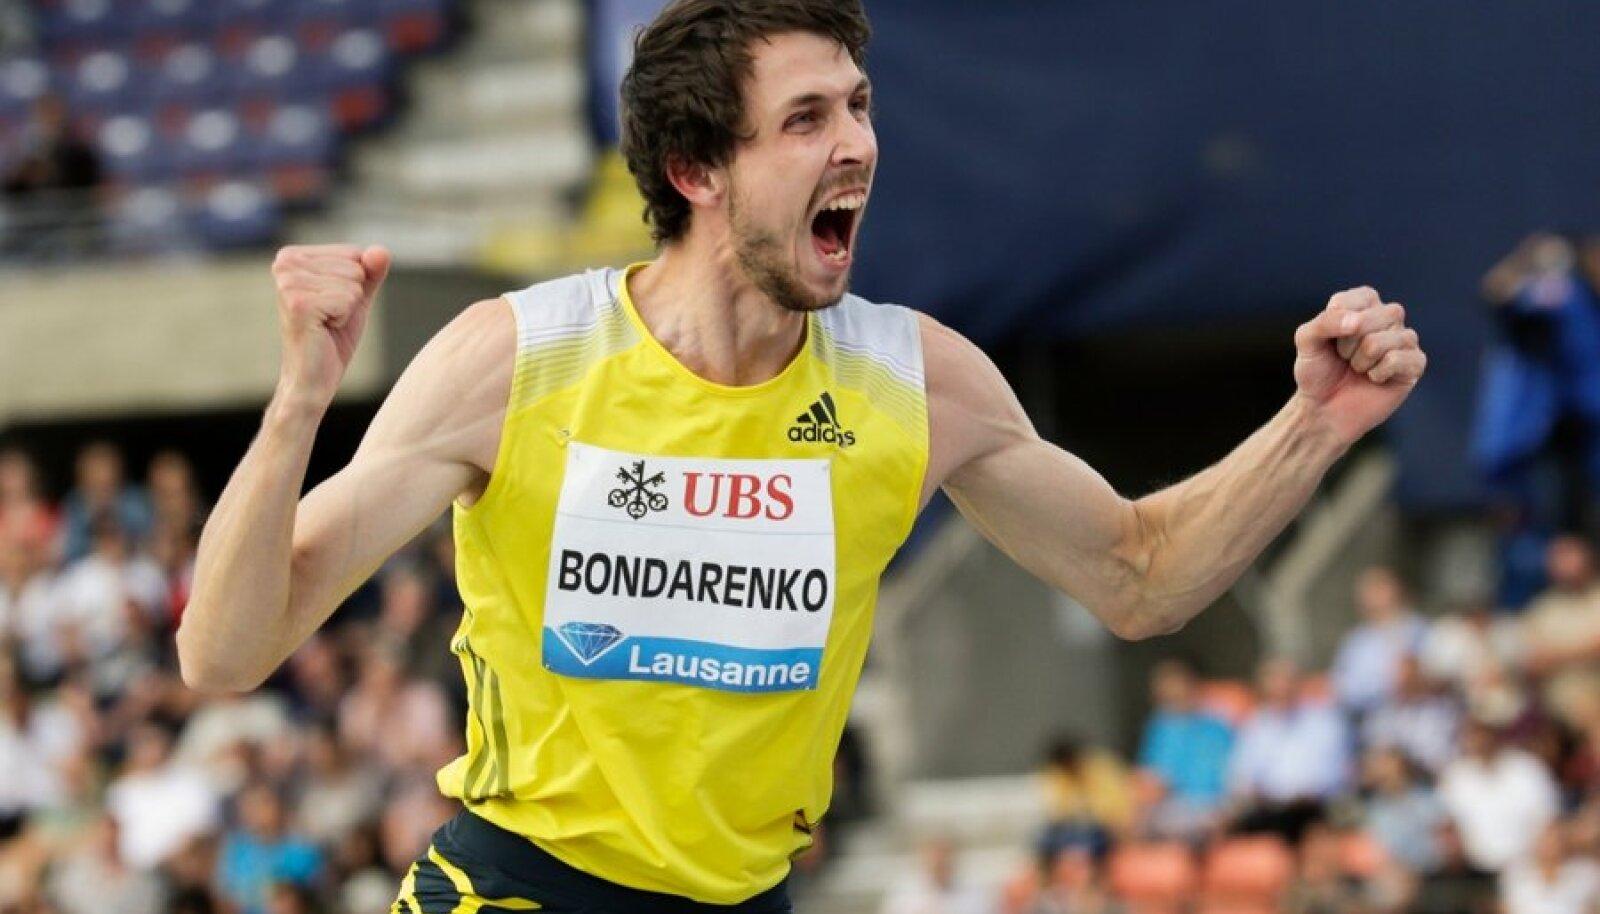 Bondarenko of Ukraine celebrates victory in the High Jump event of the Lausanne Diamond League meeting in Lausanne